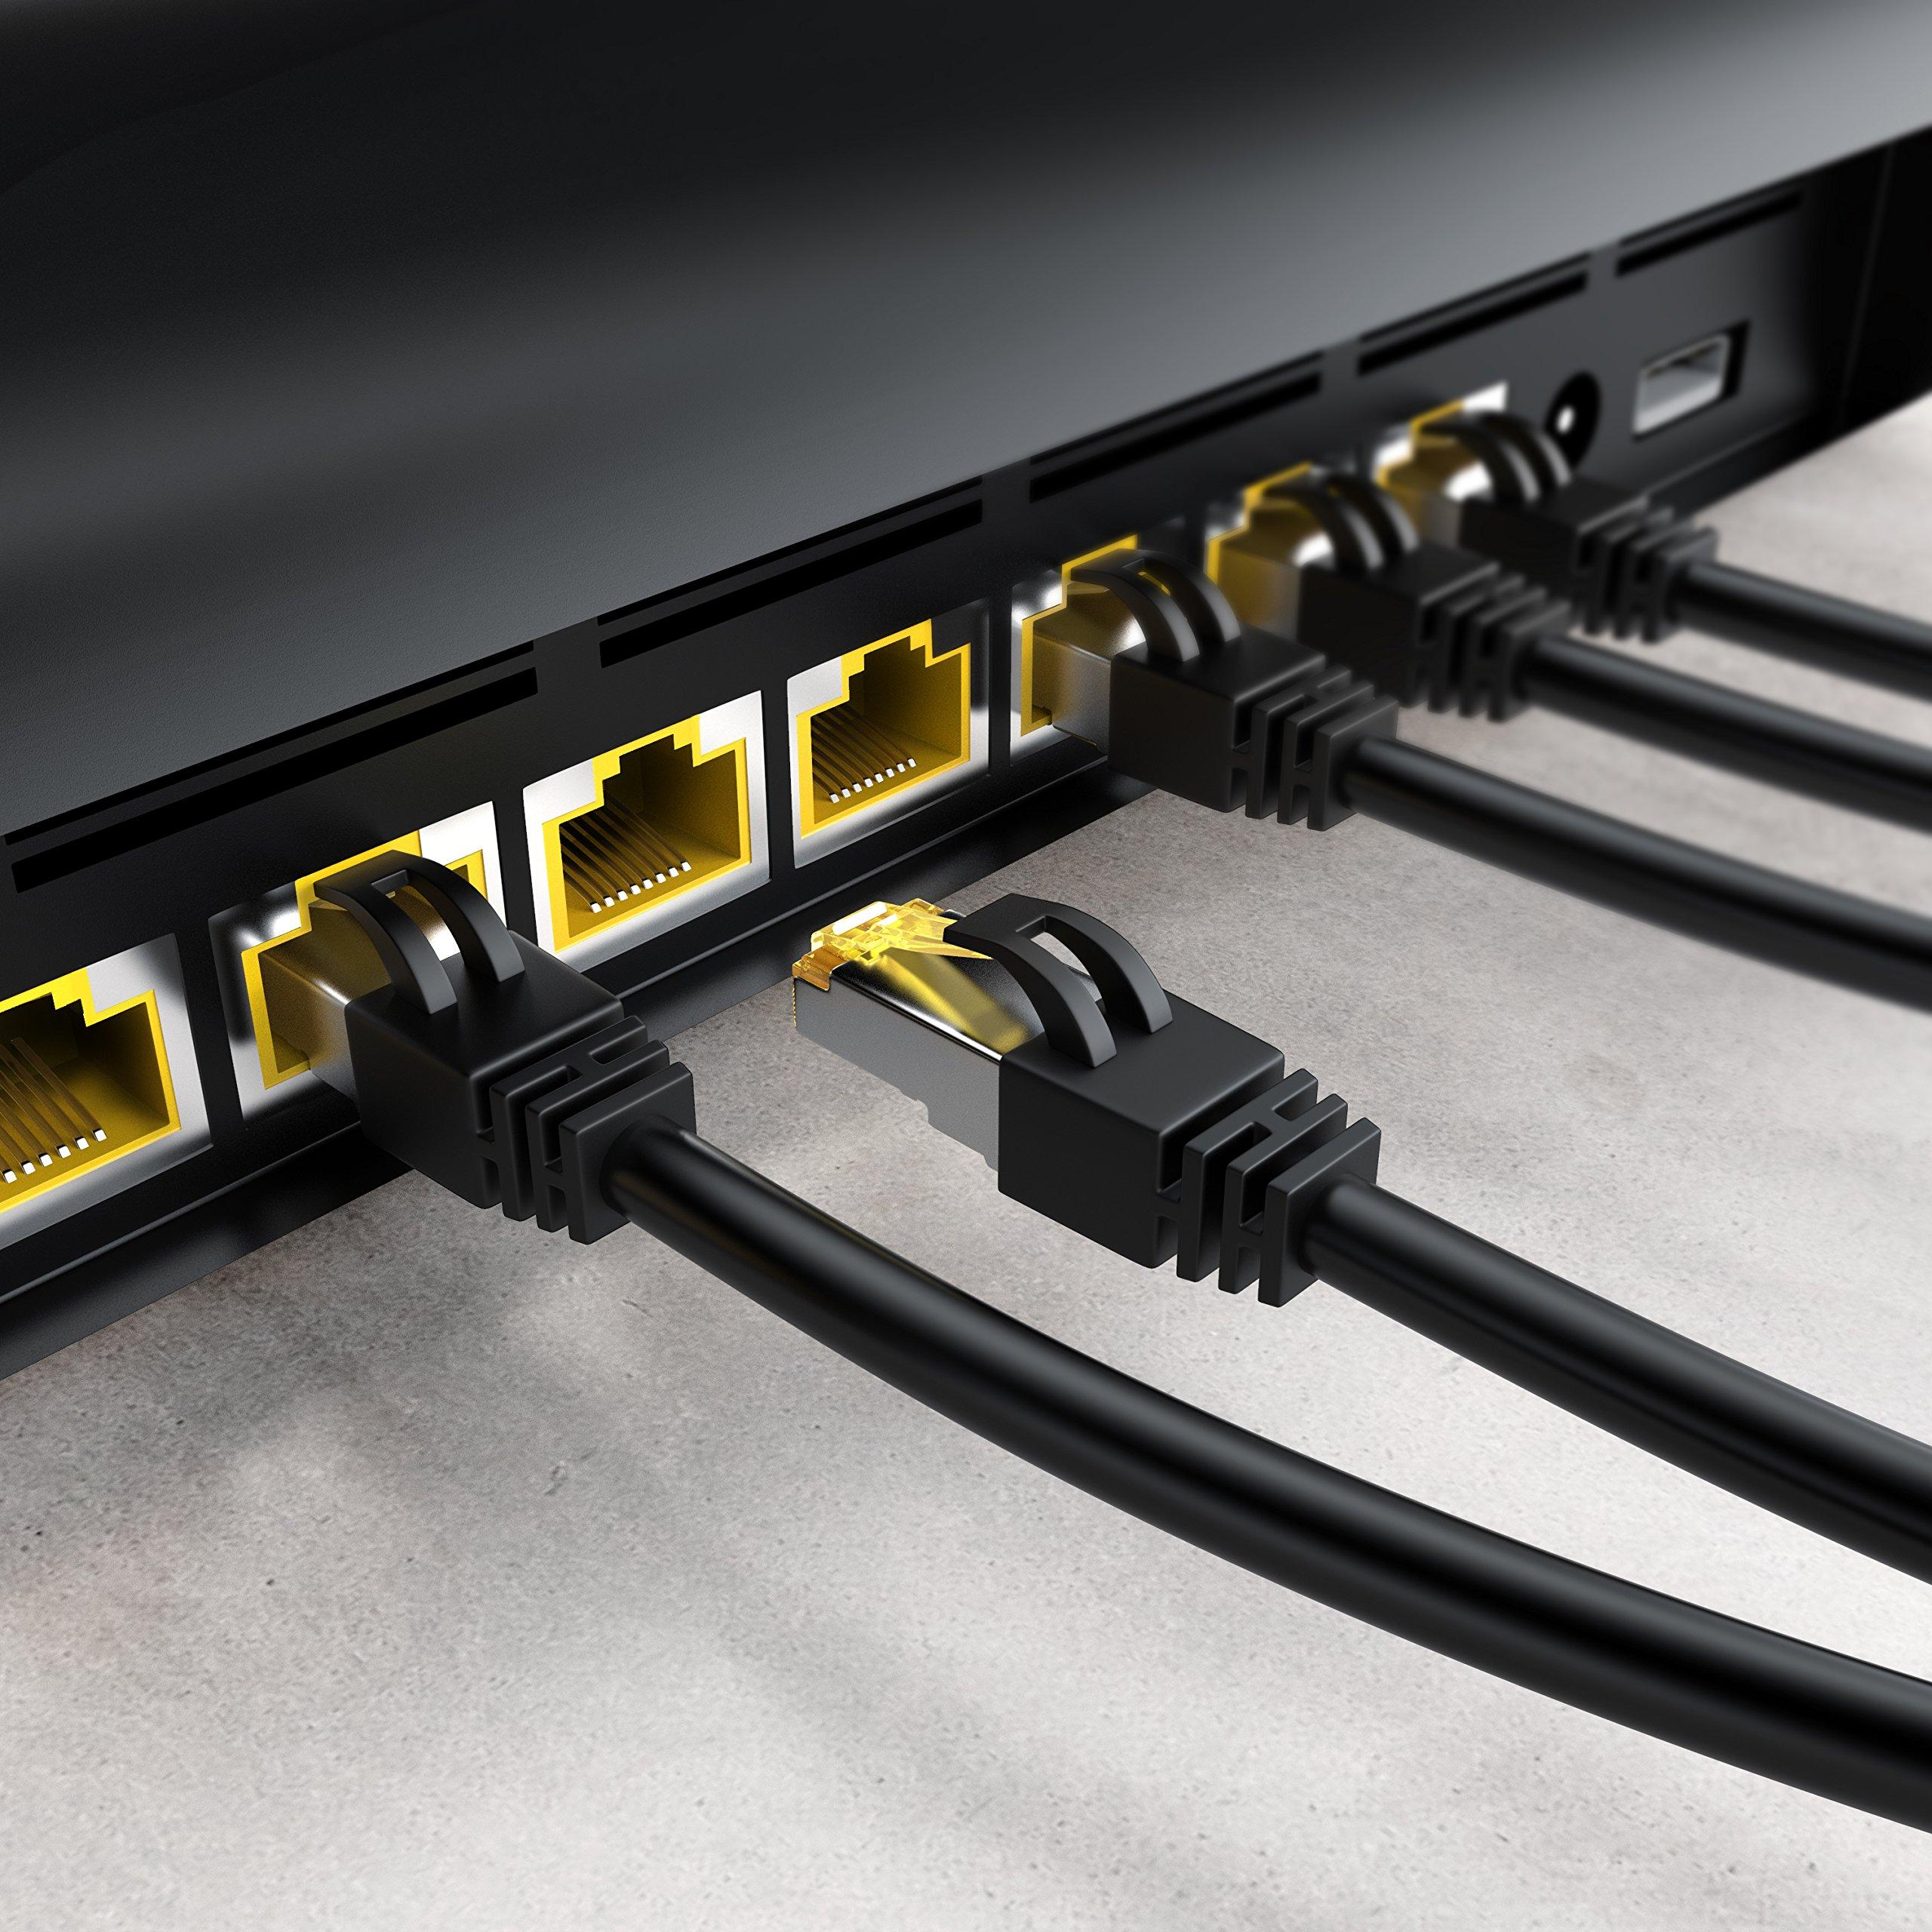 Cable de Conexi/ón Cable Cat 7 en Bruto con apantallamiento S//FTP PIMF y Conector RJ 45 Primewire 0,25m Cable de Red Gigabit Ethernet Cat 7 10000 Mbit//s Punto de Acceso Switch Router Modem